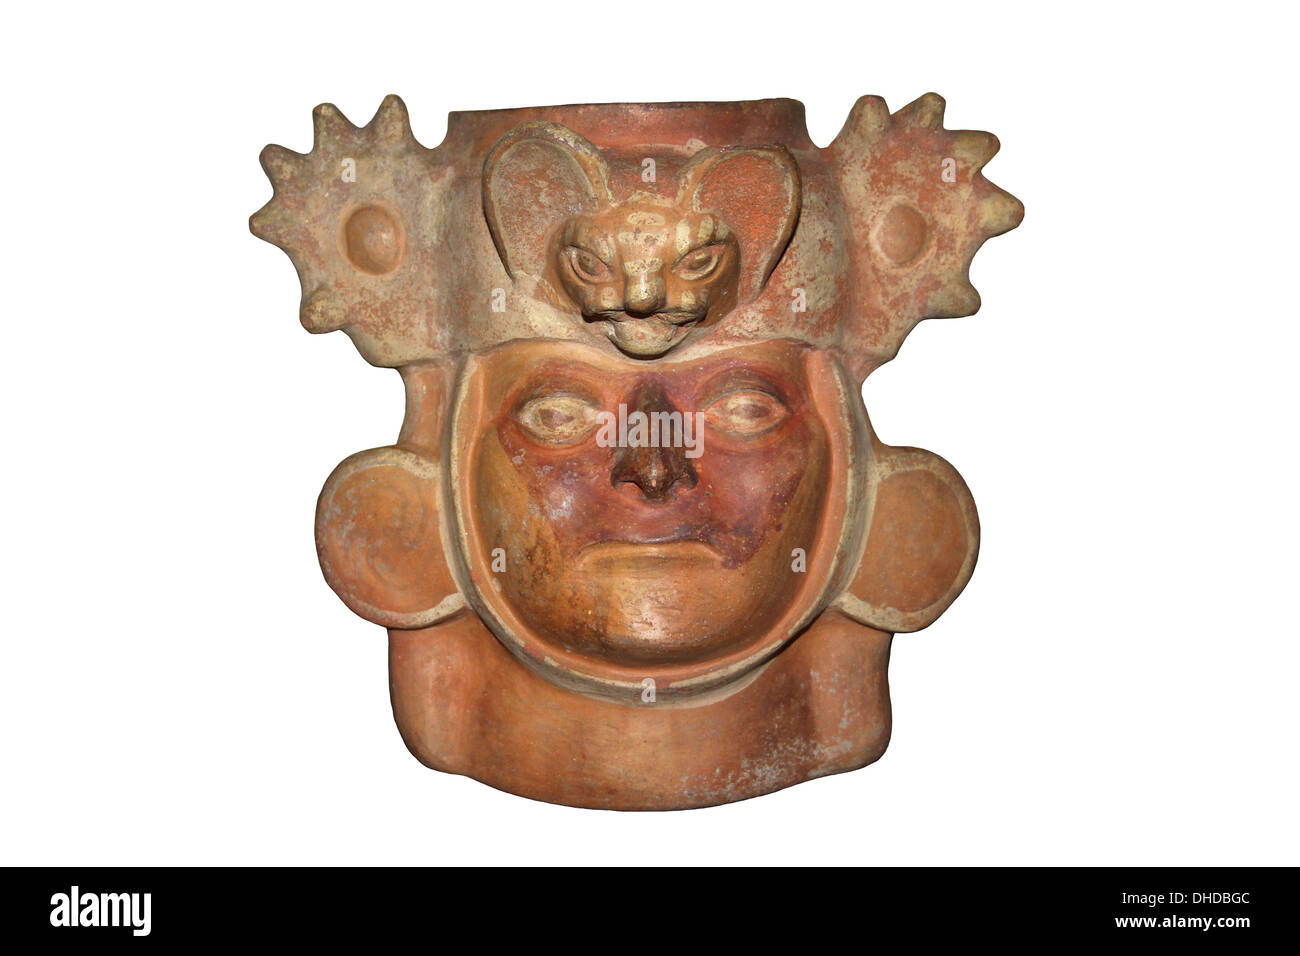 Moche Pottery Of A Man Wearing A Batskin Headdress Which May Represent A Folk Healer - Stock Image